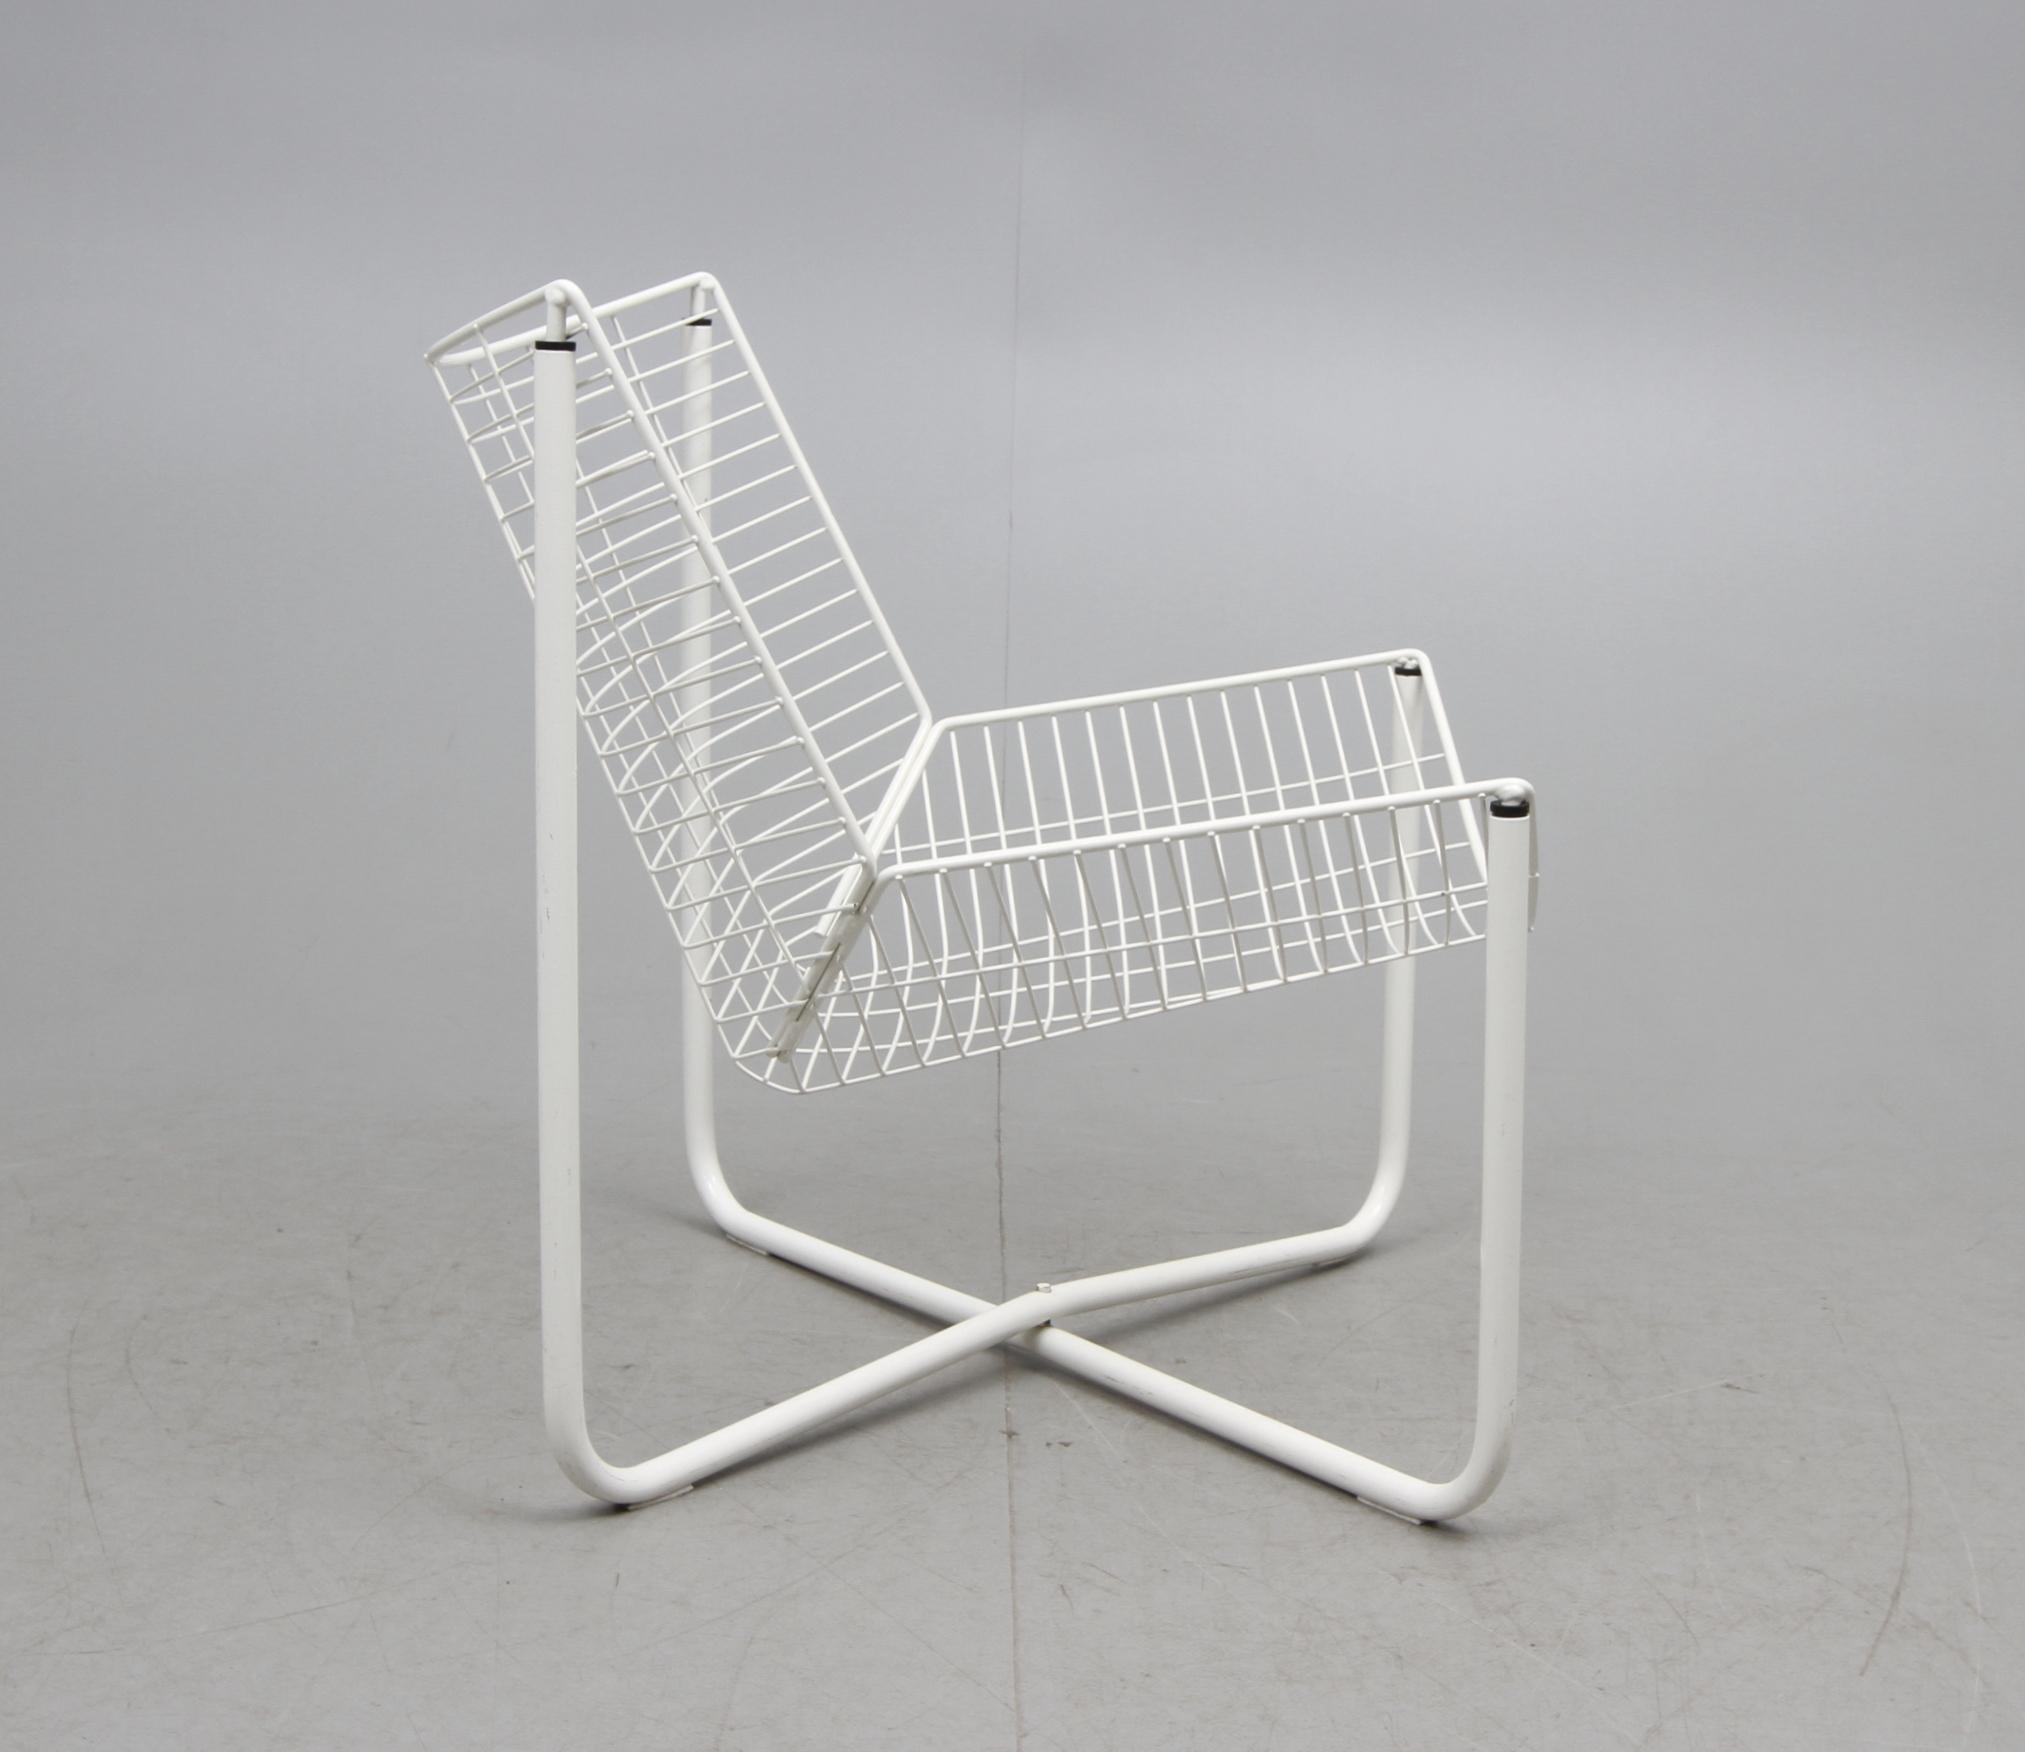 superbe et rare fauteuil m tal adulte scandinave ikea vintage design ann es 1980 ebay. Black Bedroom Furniture Sets. Home Design Ideas